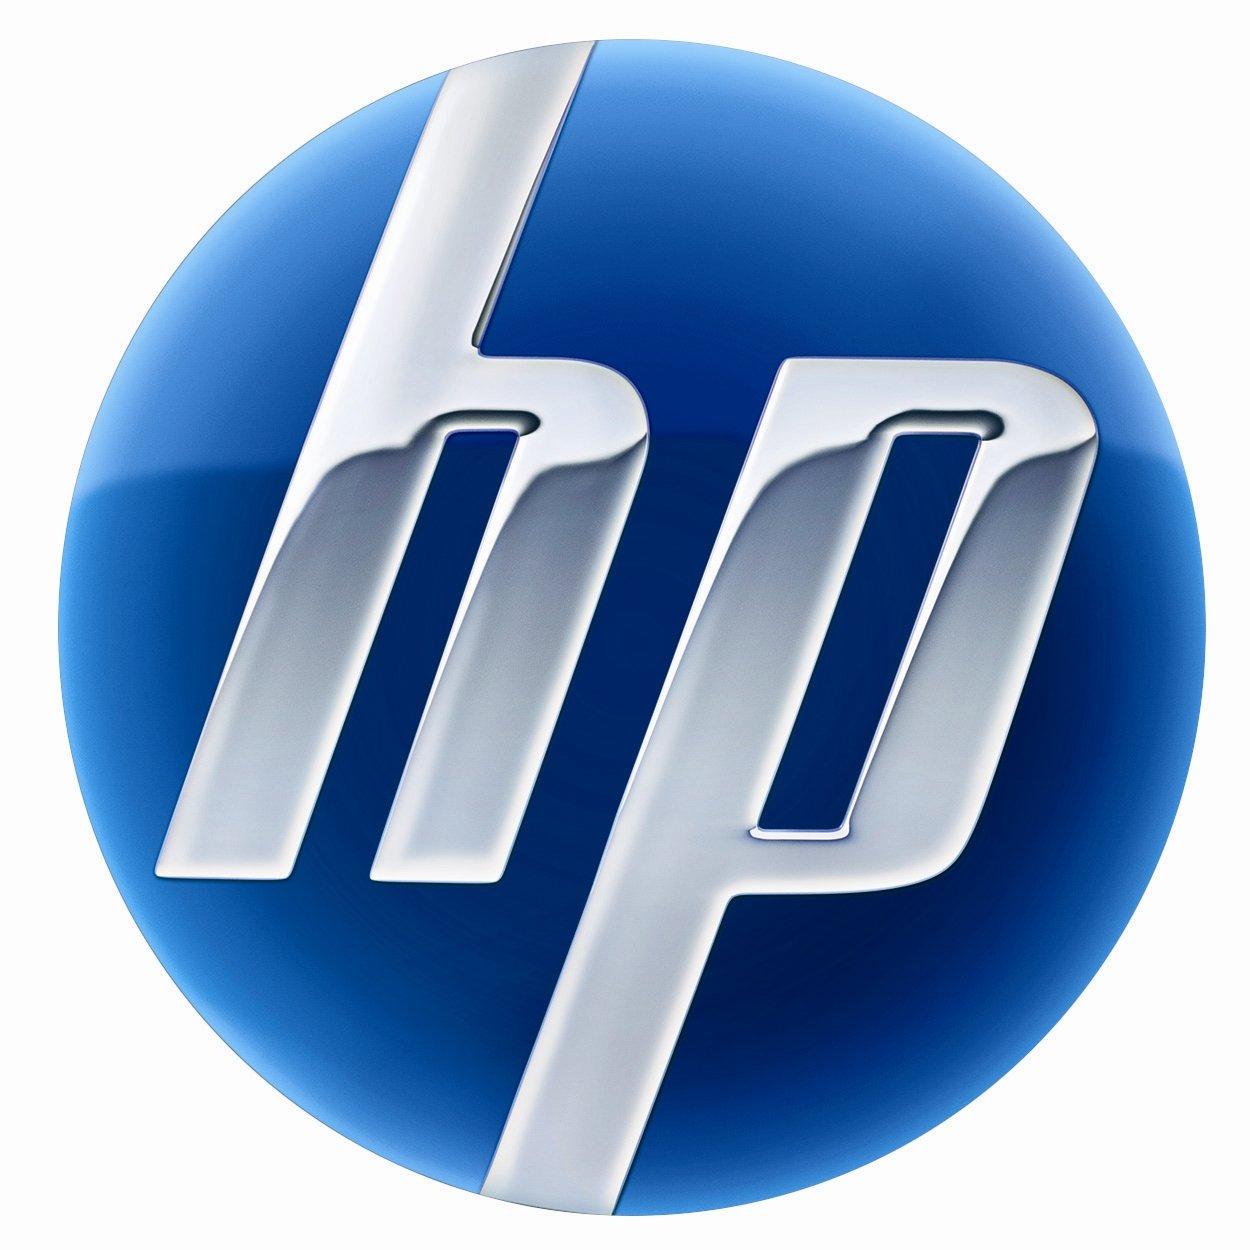 hp logo wallpaper wallpapersafari logo maker pro free logo maker phone number